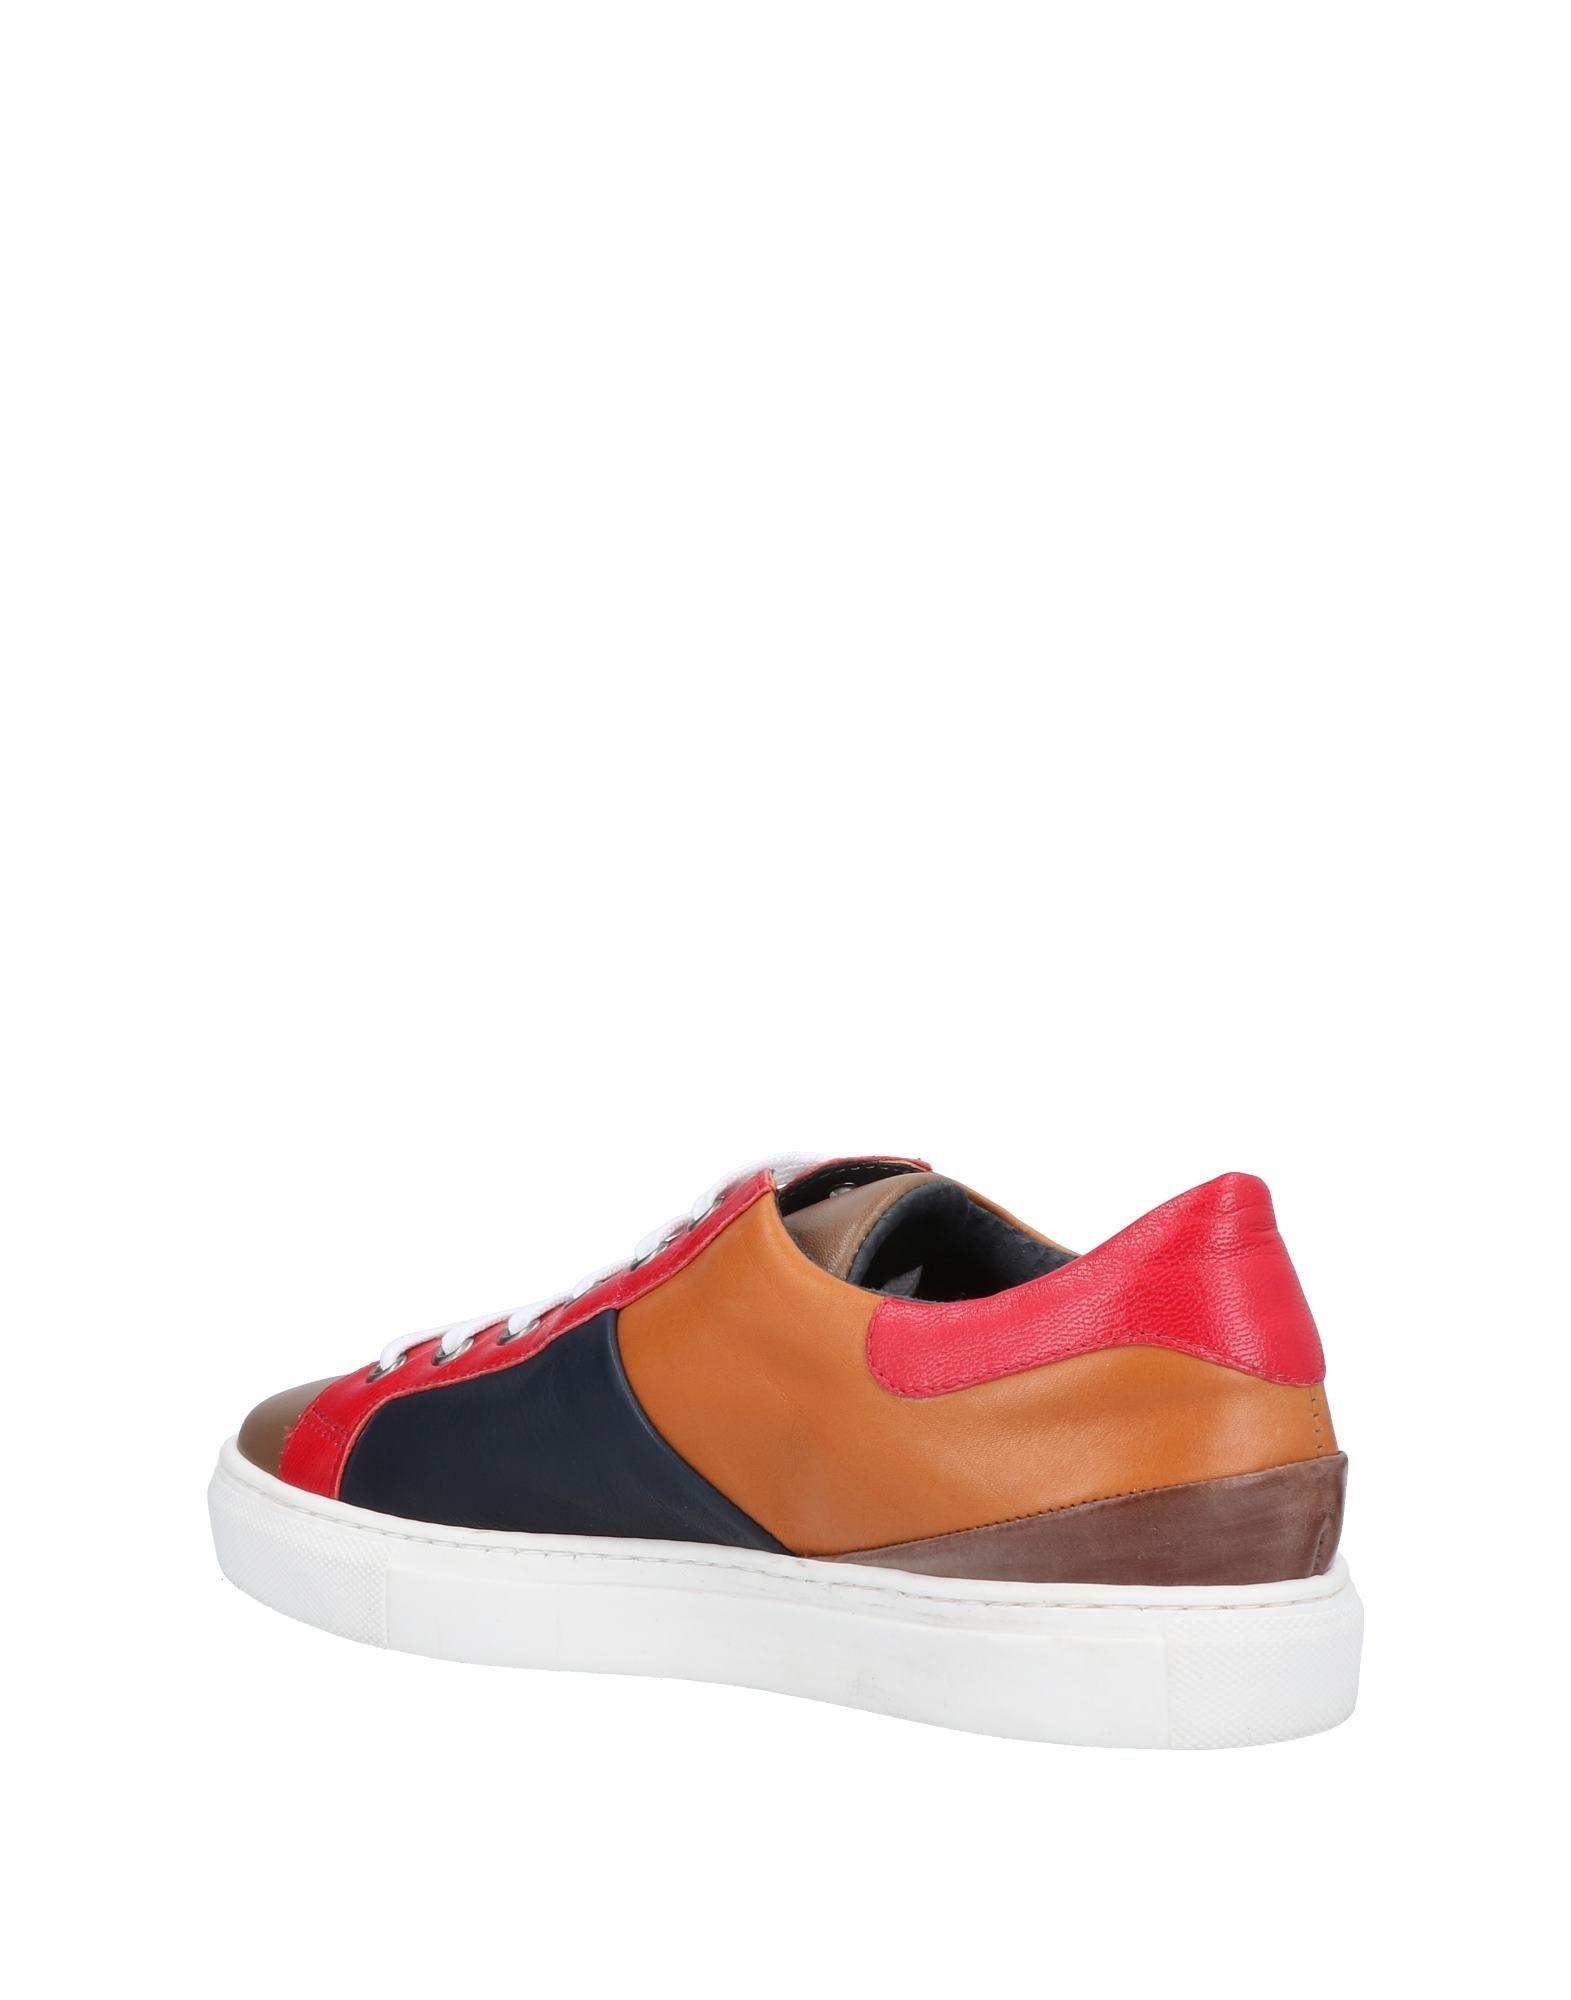 A buon mercato Sneakers Tsd12 Donna - 11453897CD